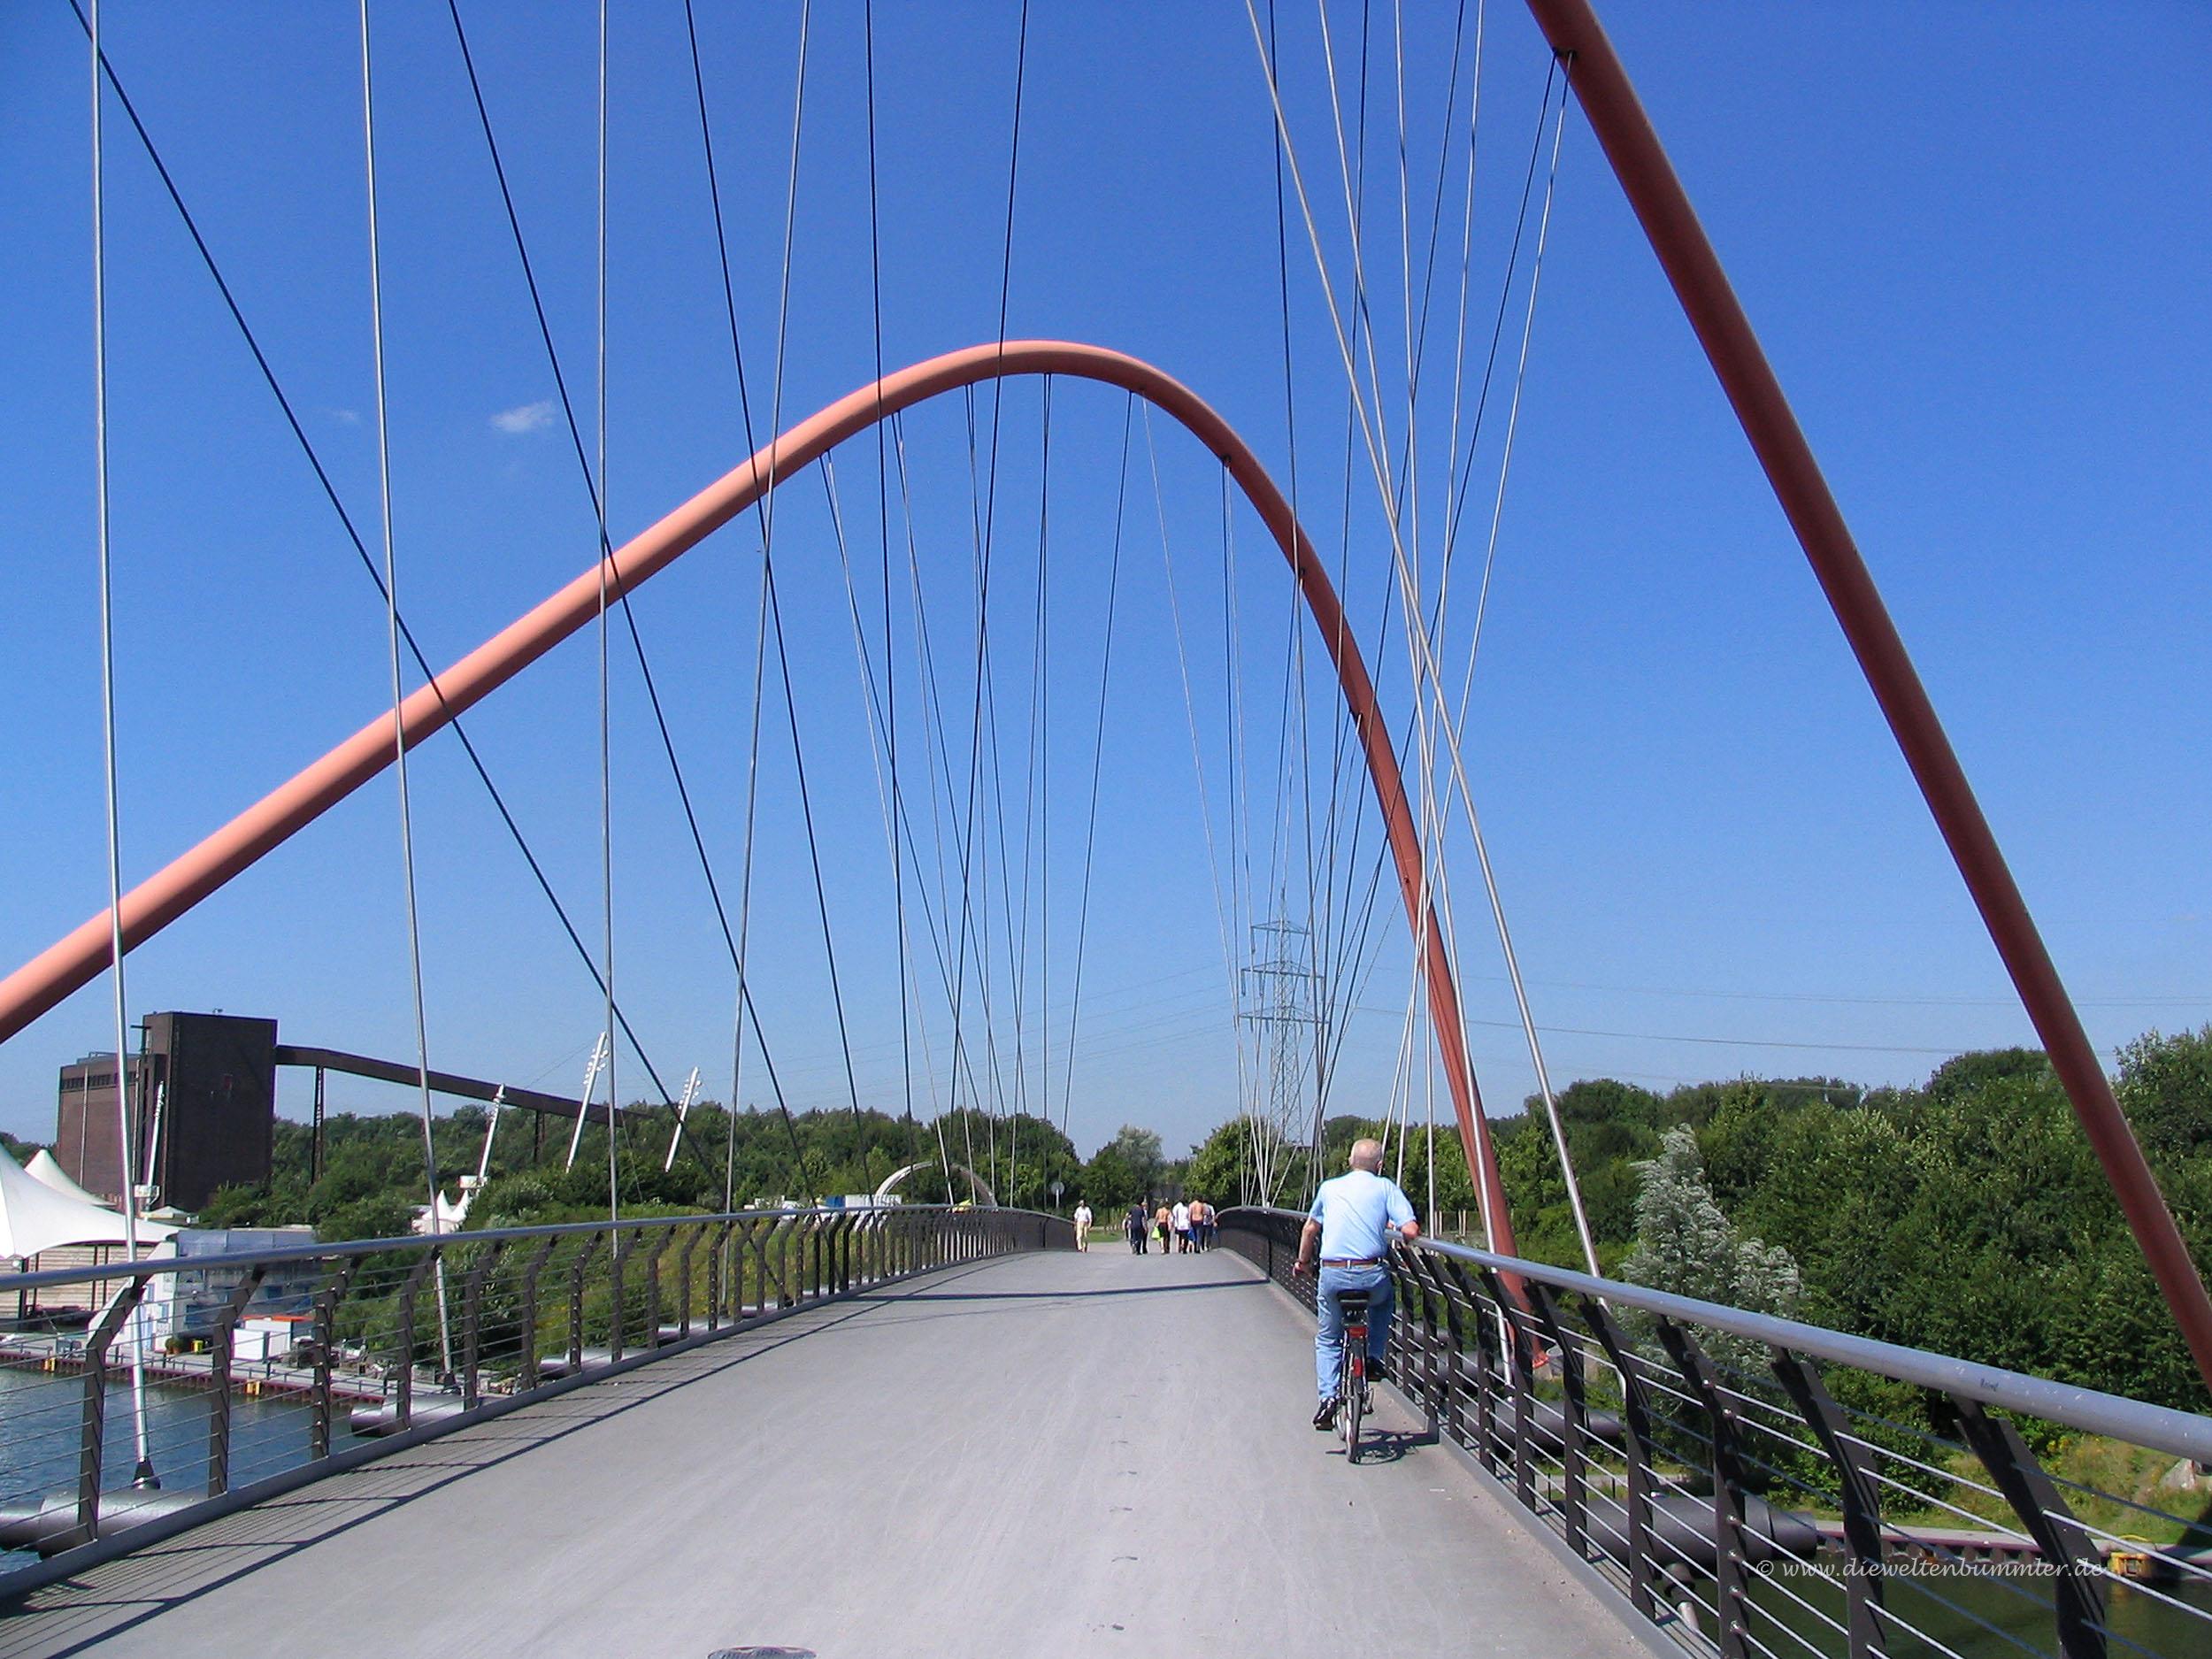 Bogenbrücke über dem Rhein-Herne-Kanal